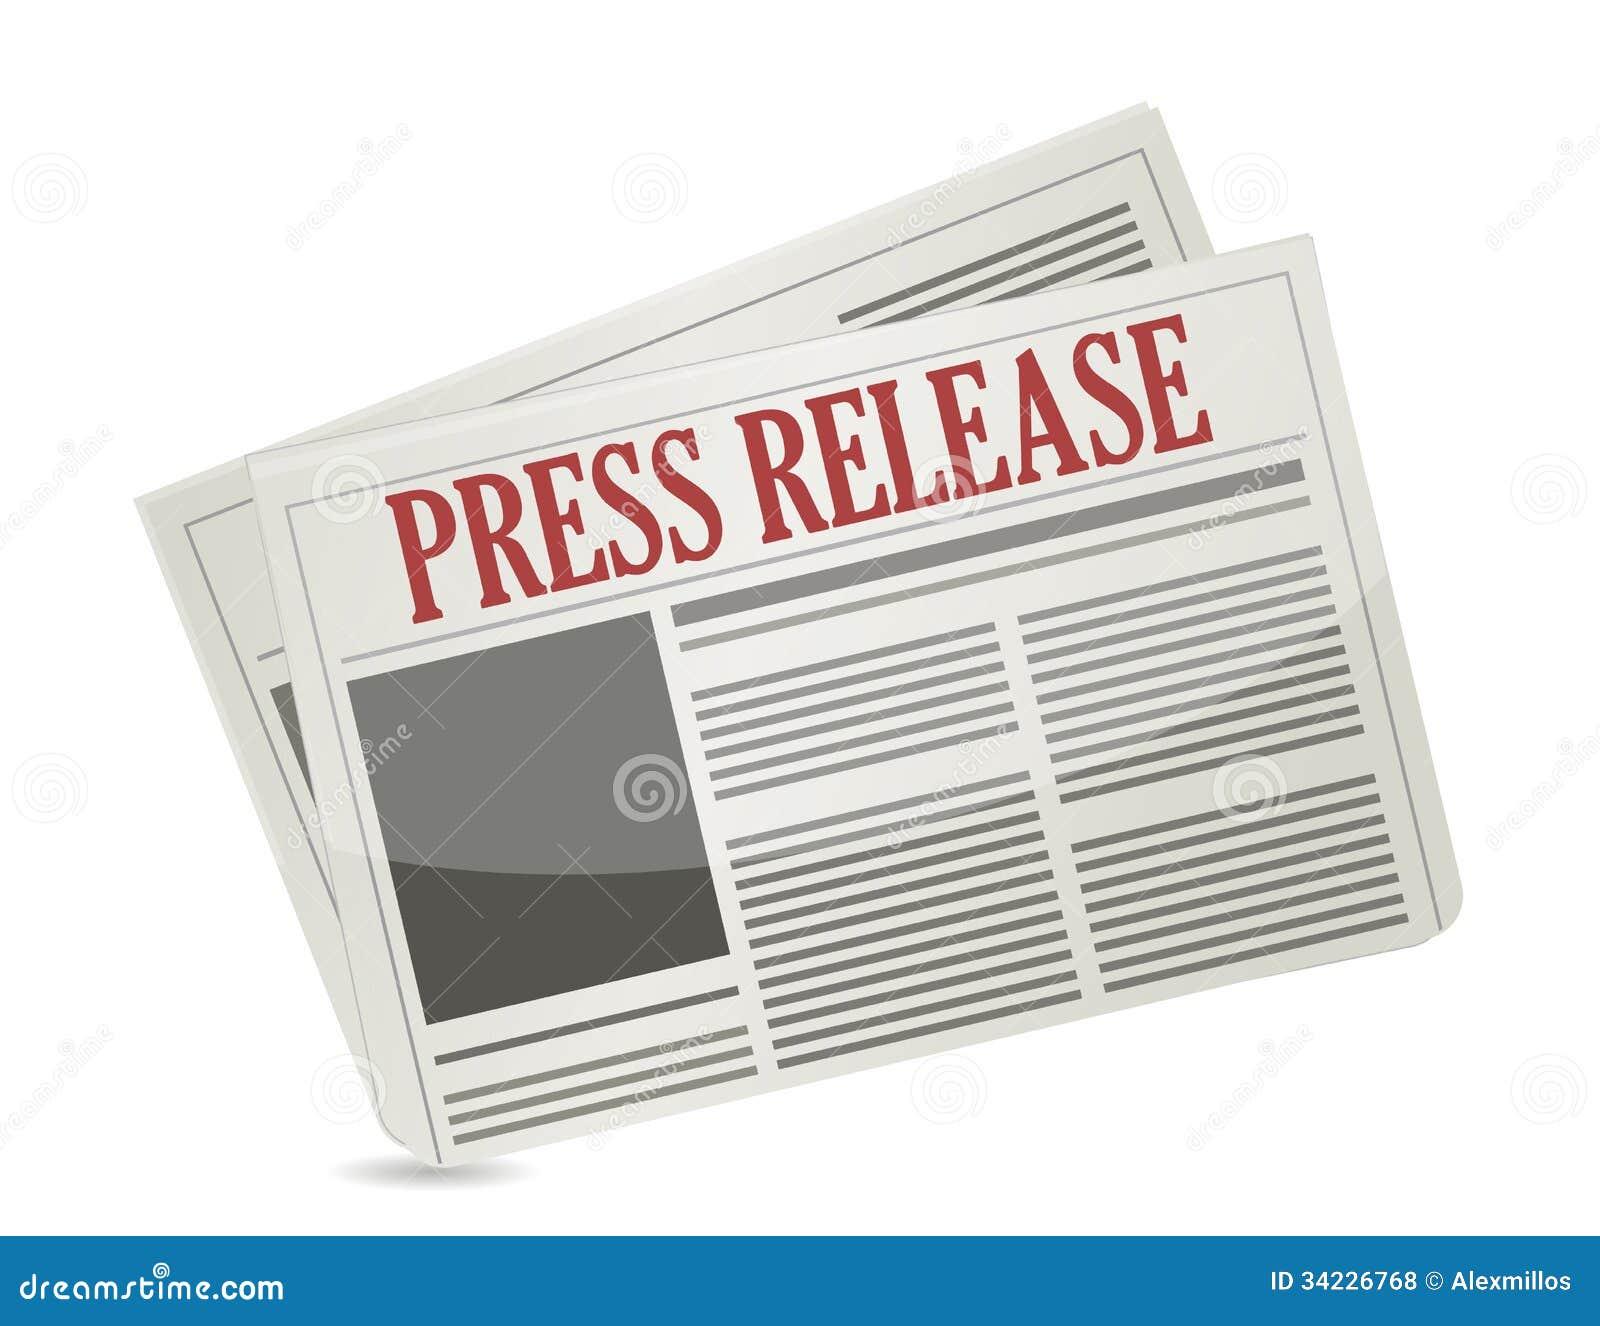 Press Release Newspaper Illustration Design Royalty Free